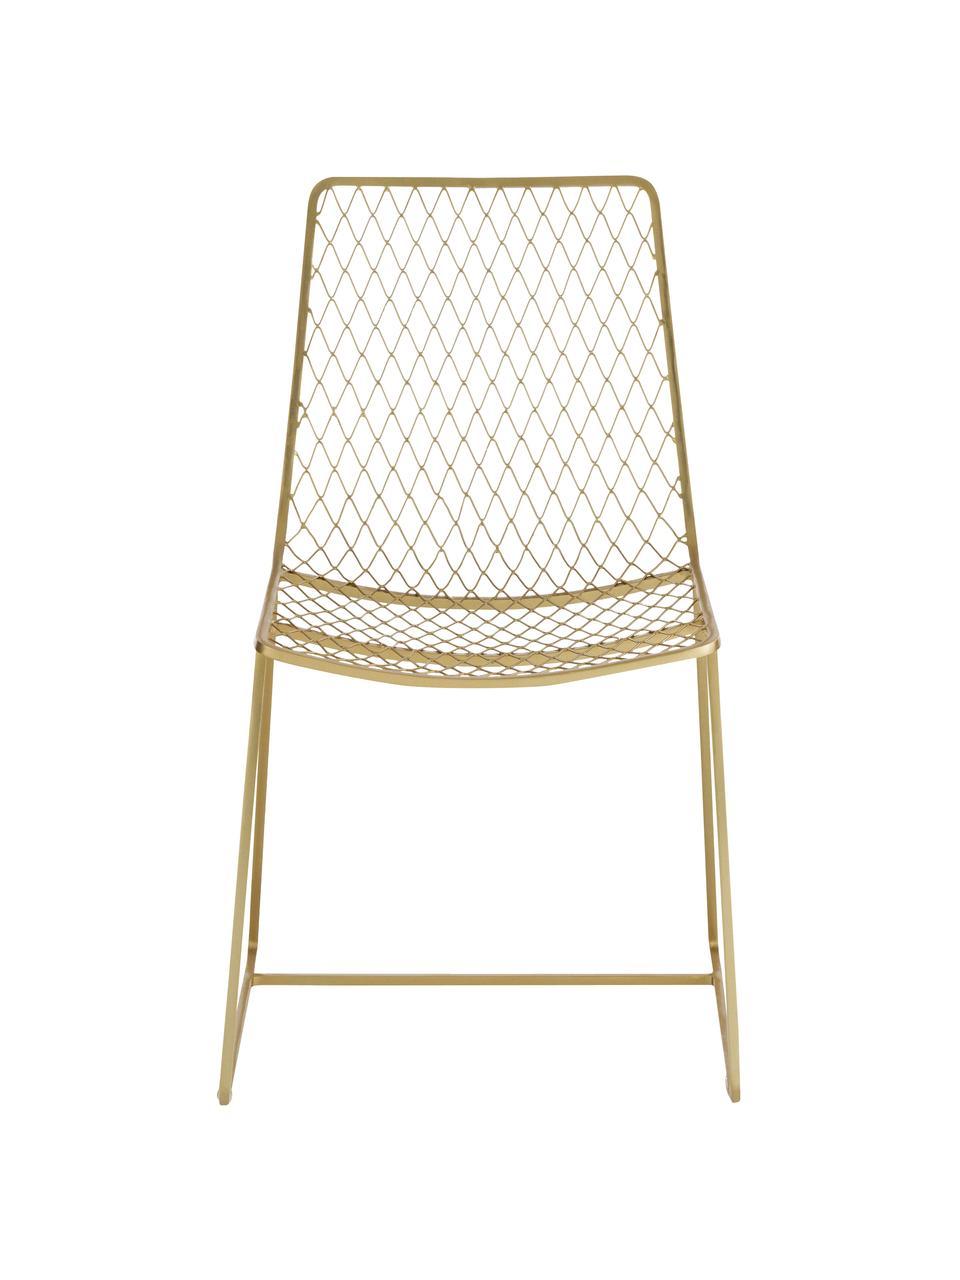 Sedia in metallo ottonato Kira, Metallo ottonato, Ottonato, Larg. 50 x Prof. 52 cm